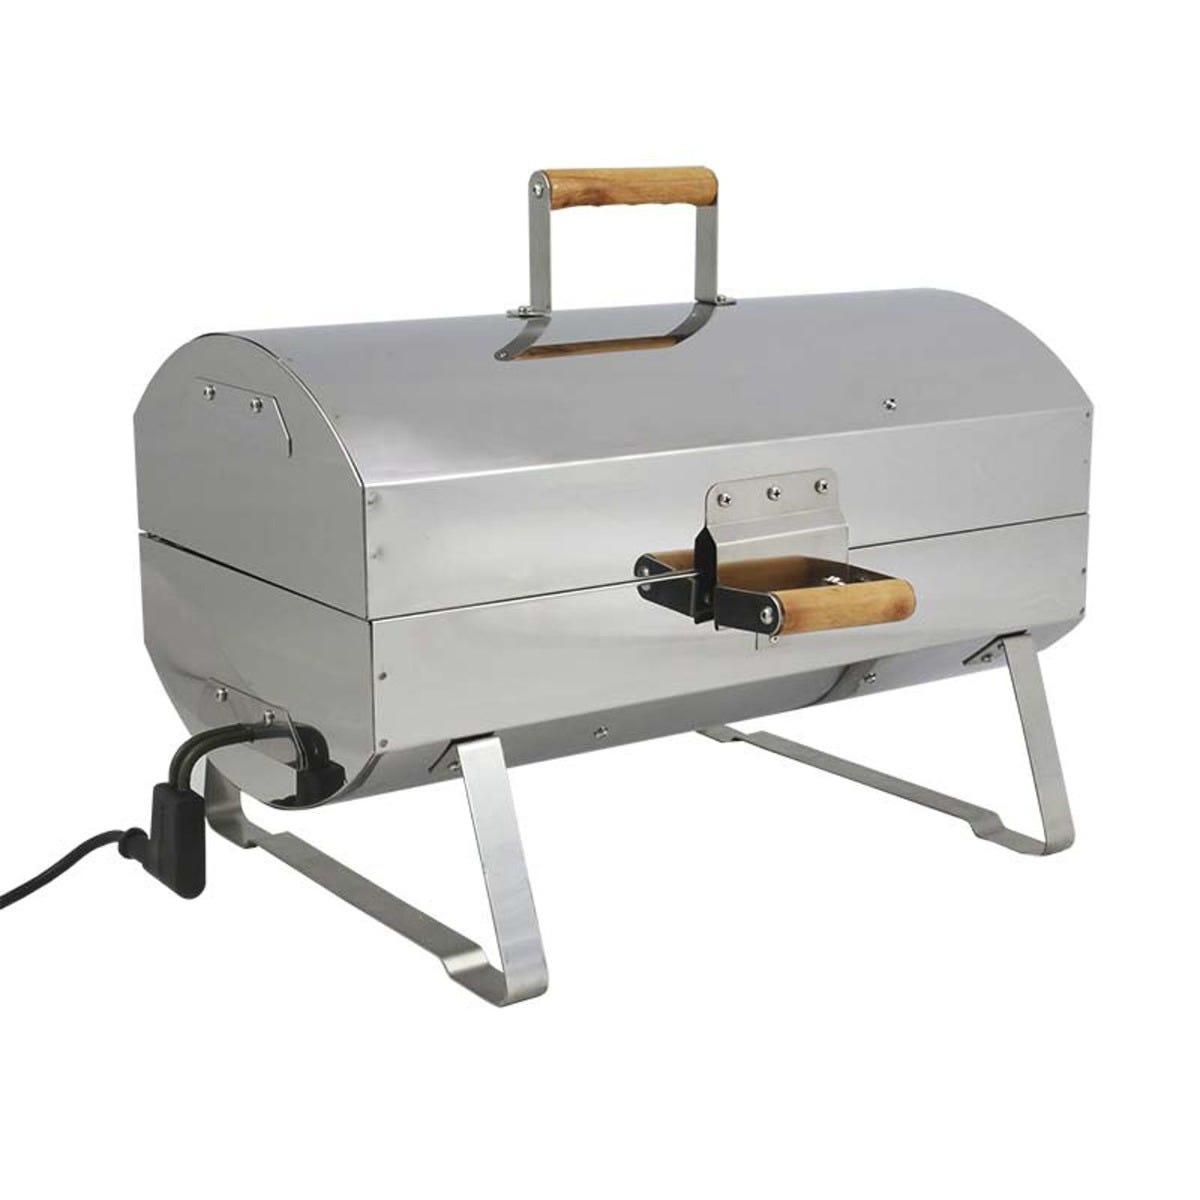 Muurikka Elektrisk Røyker/grill 1200 W